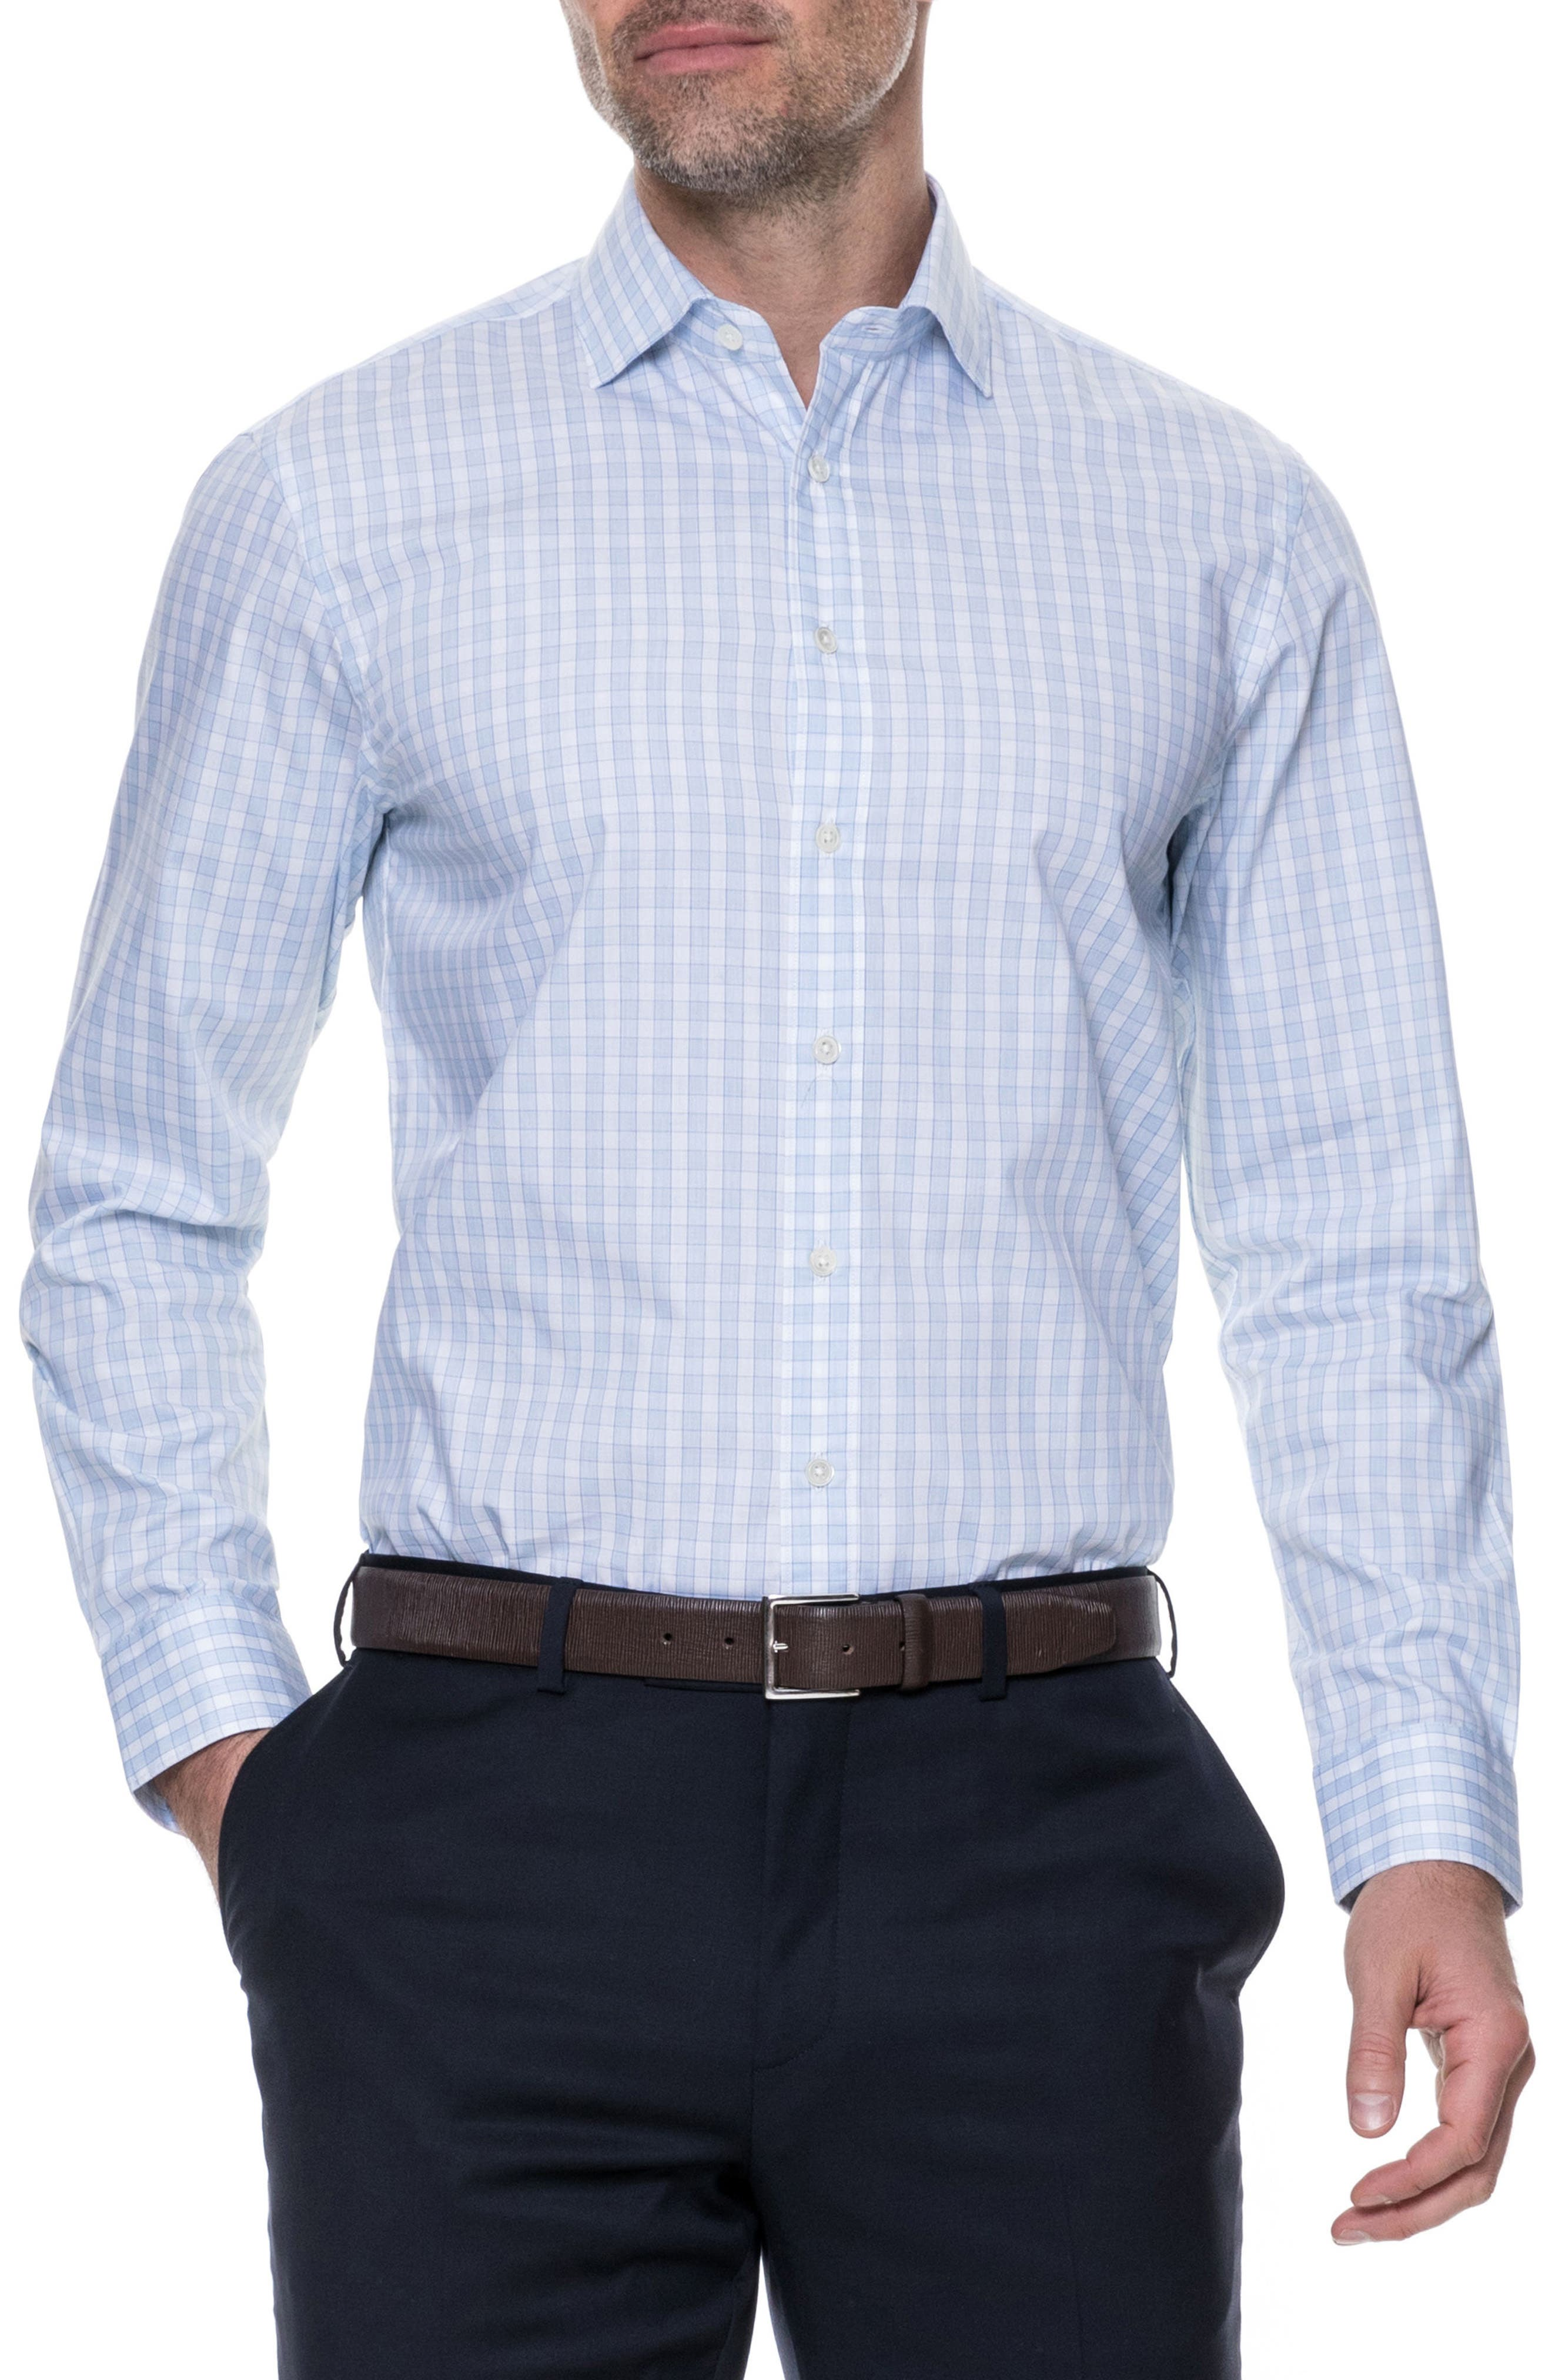 Brackley Slim Fit Sport Shirt,                         Main,                         color,